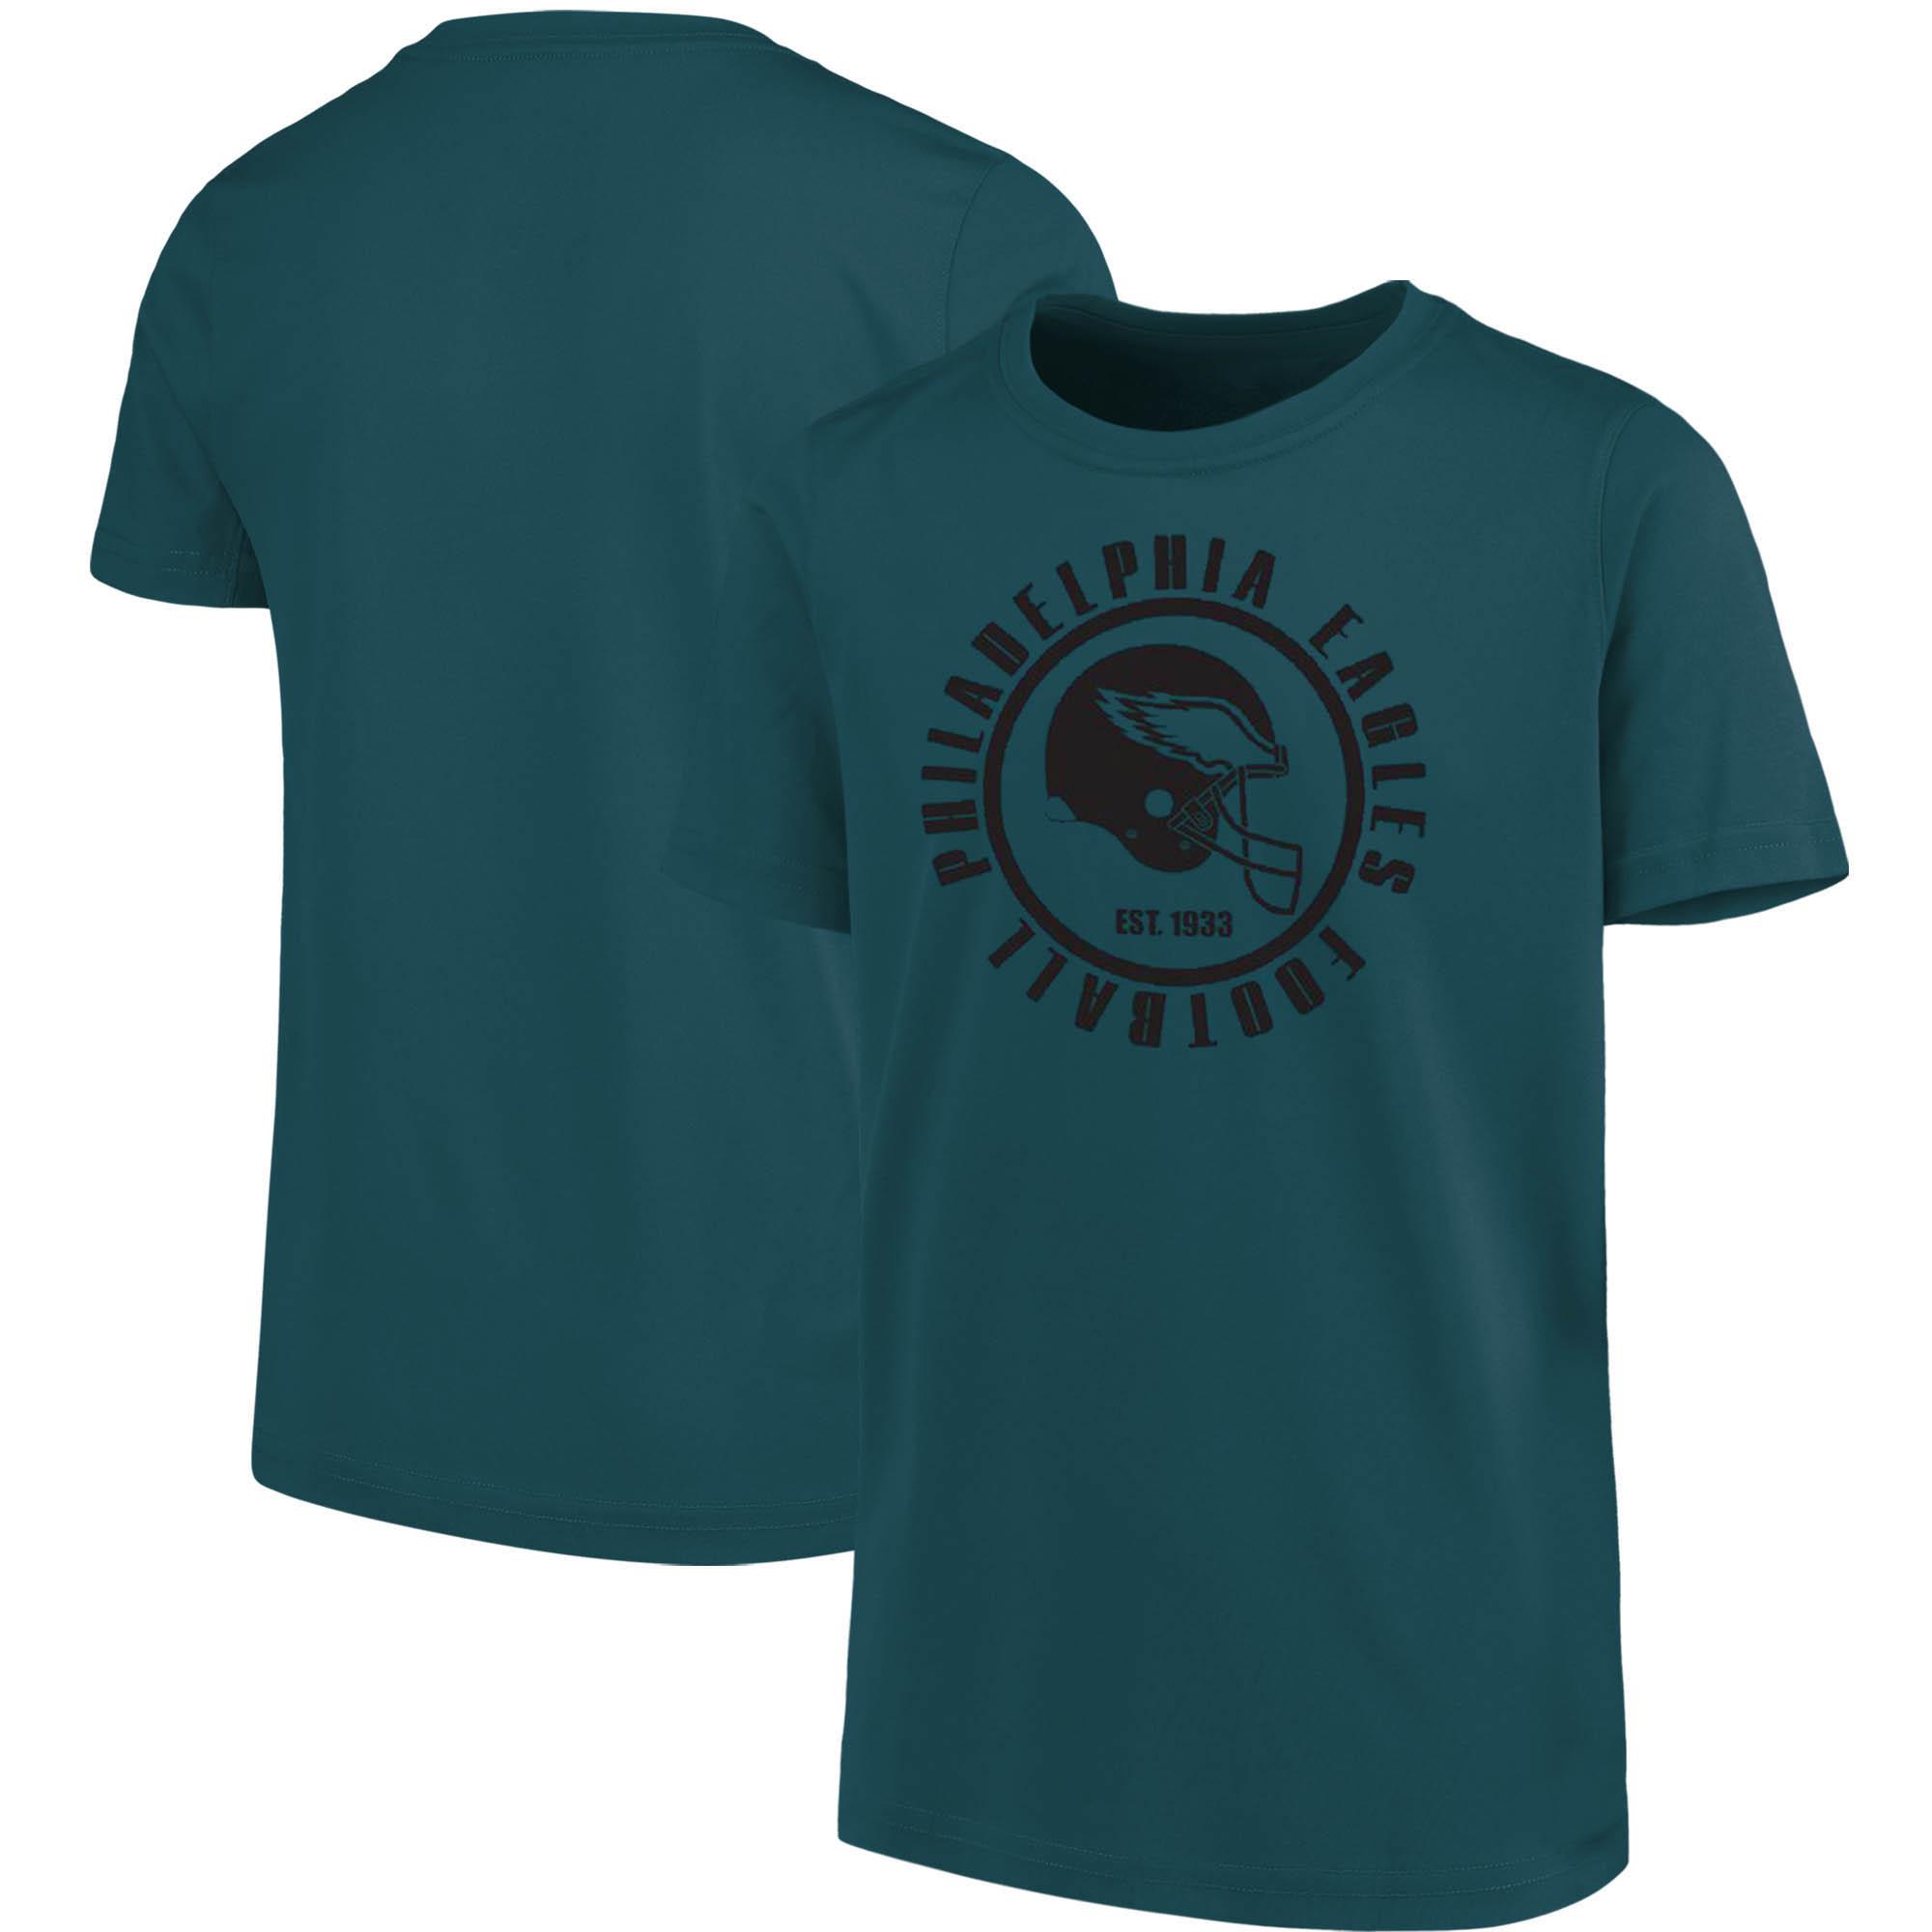 Youth Midnight Green Philadelphia Eagles Circle T-Shirt